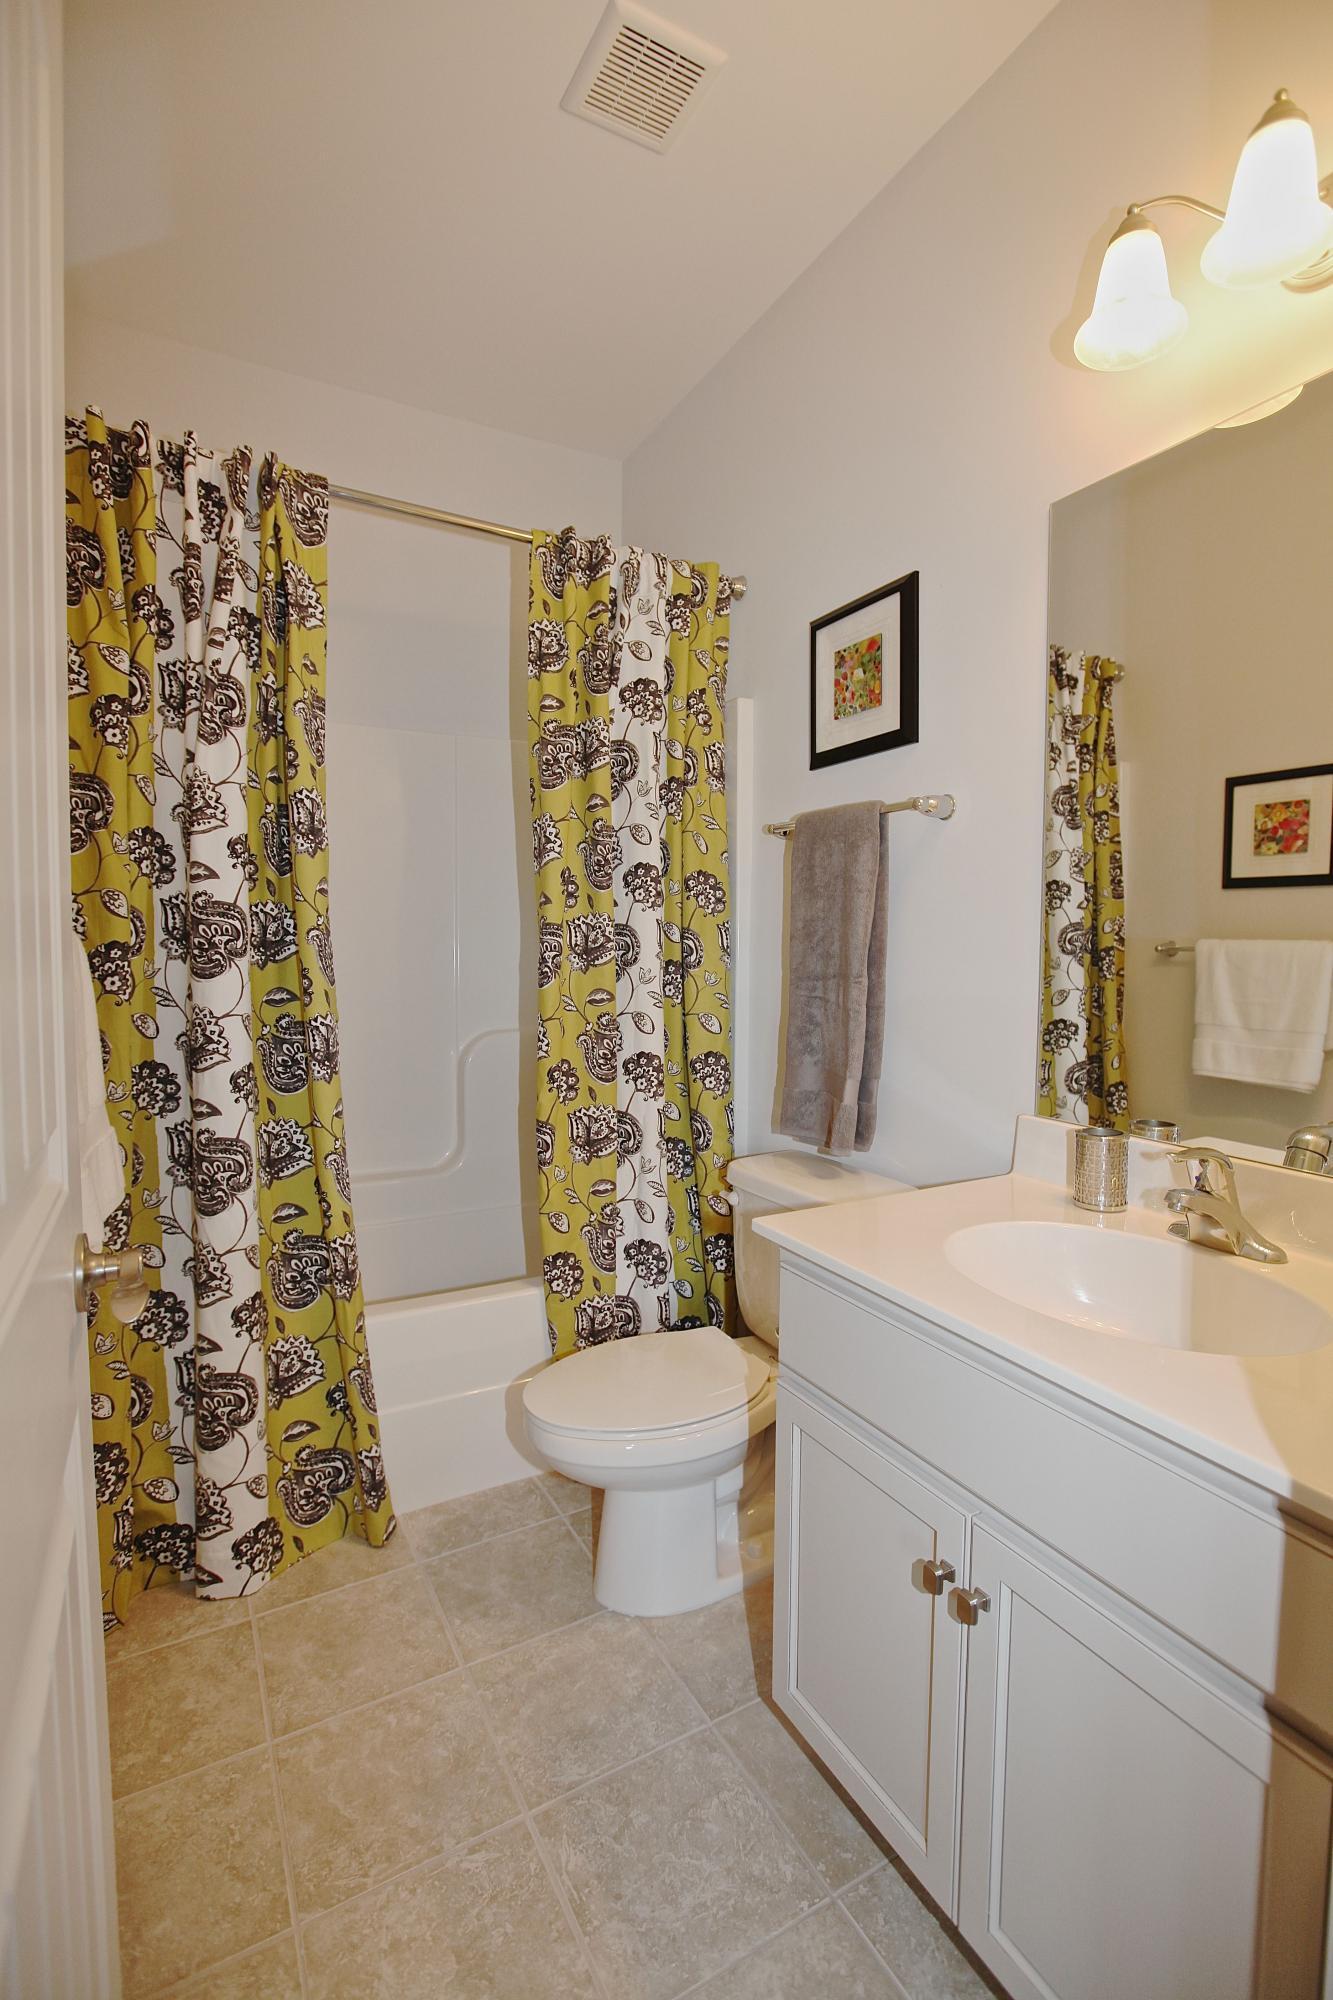 Bathroom featured in the Oglethorpe By Konter Quality Homes in Savannah, GA